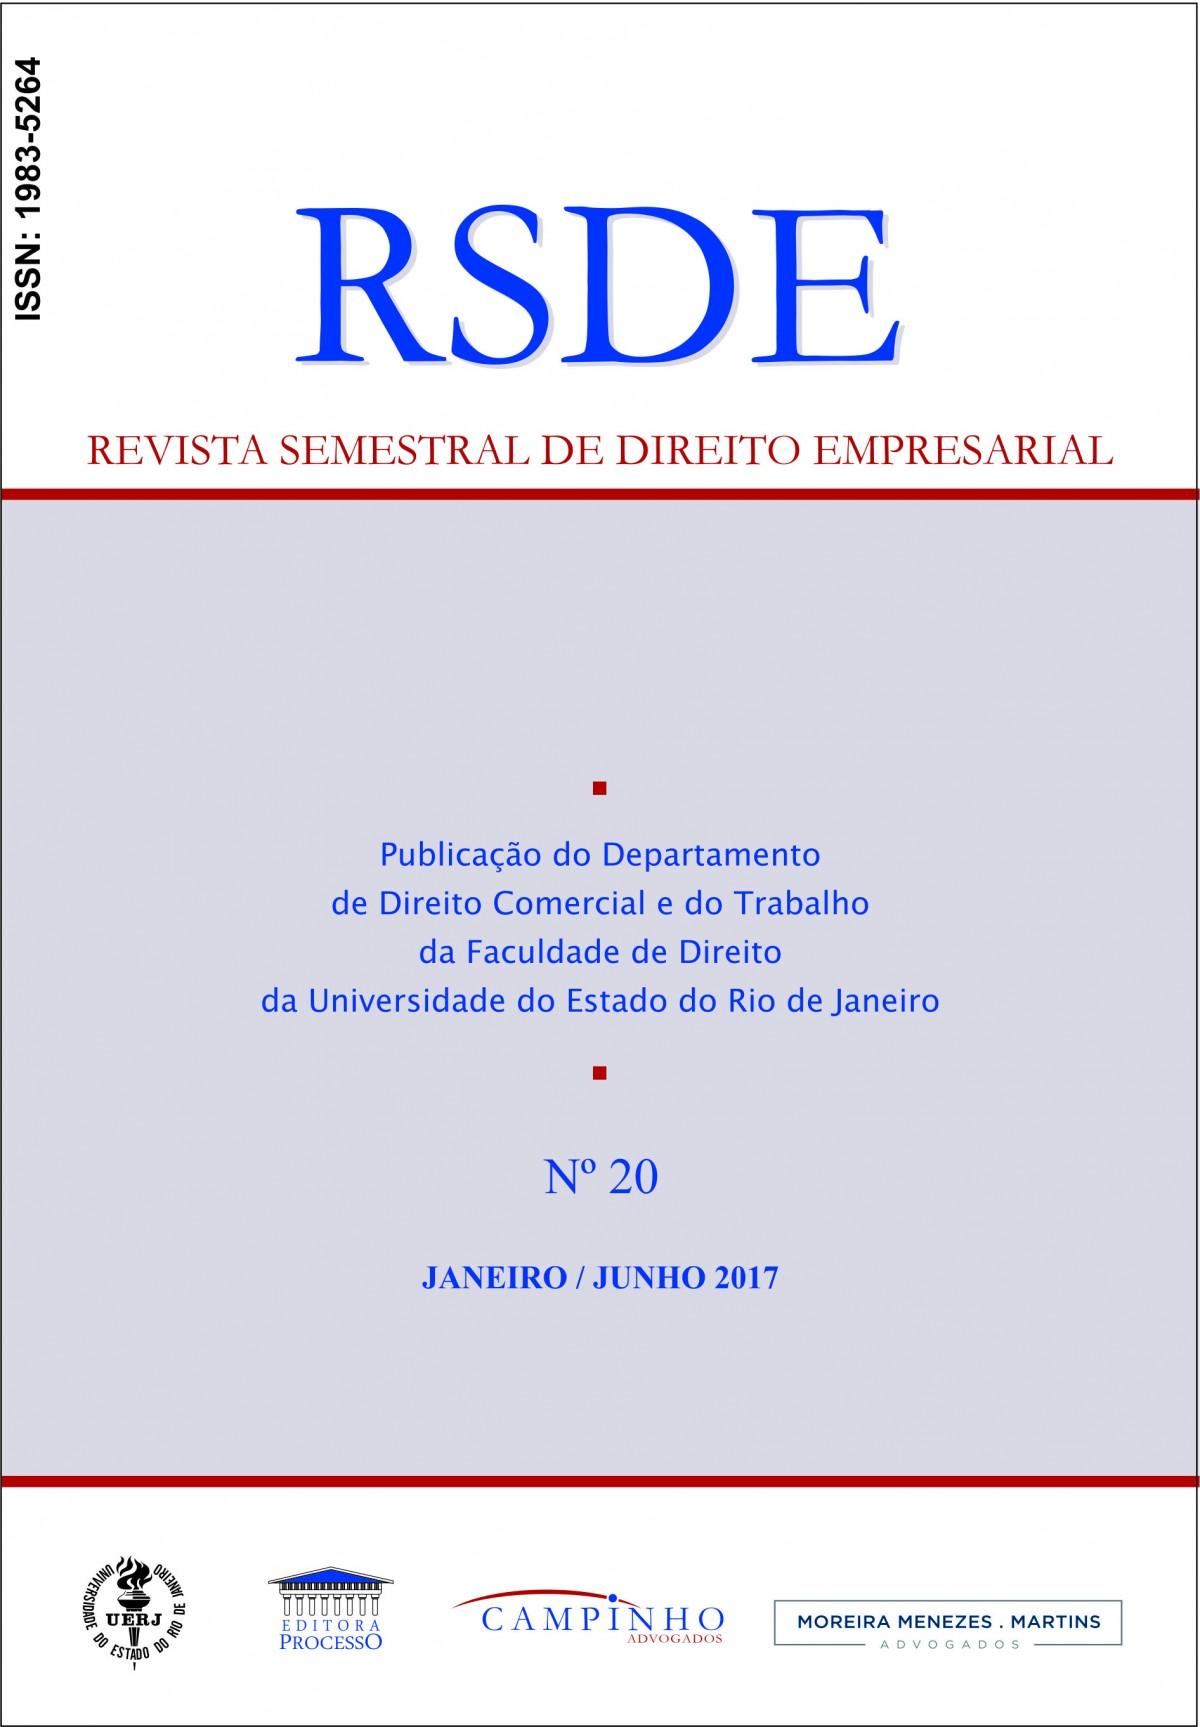 Foto 1 - RSDE Nº20